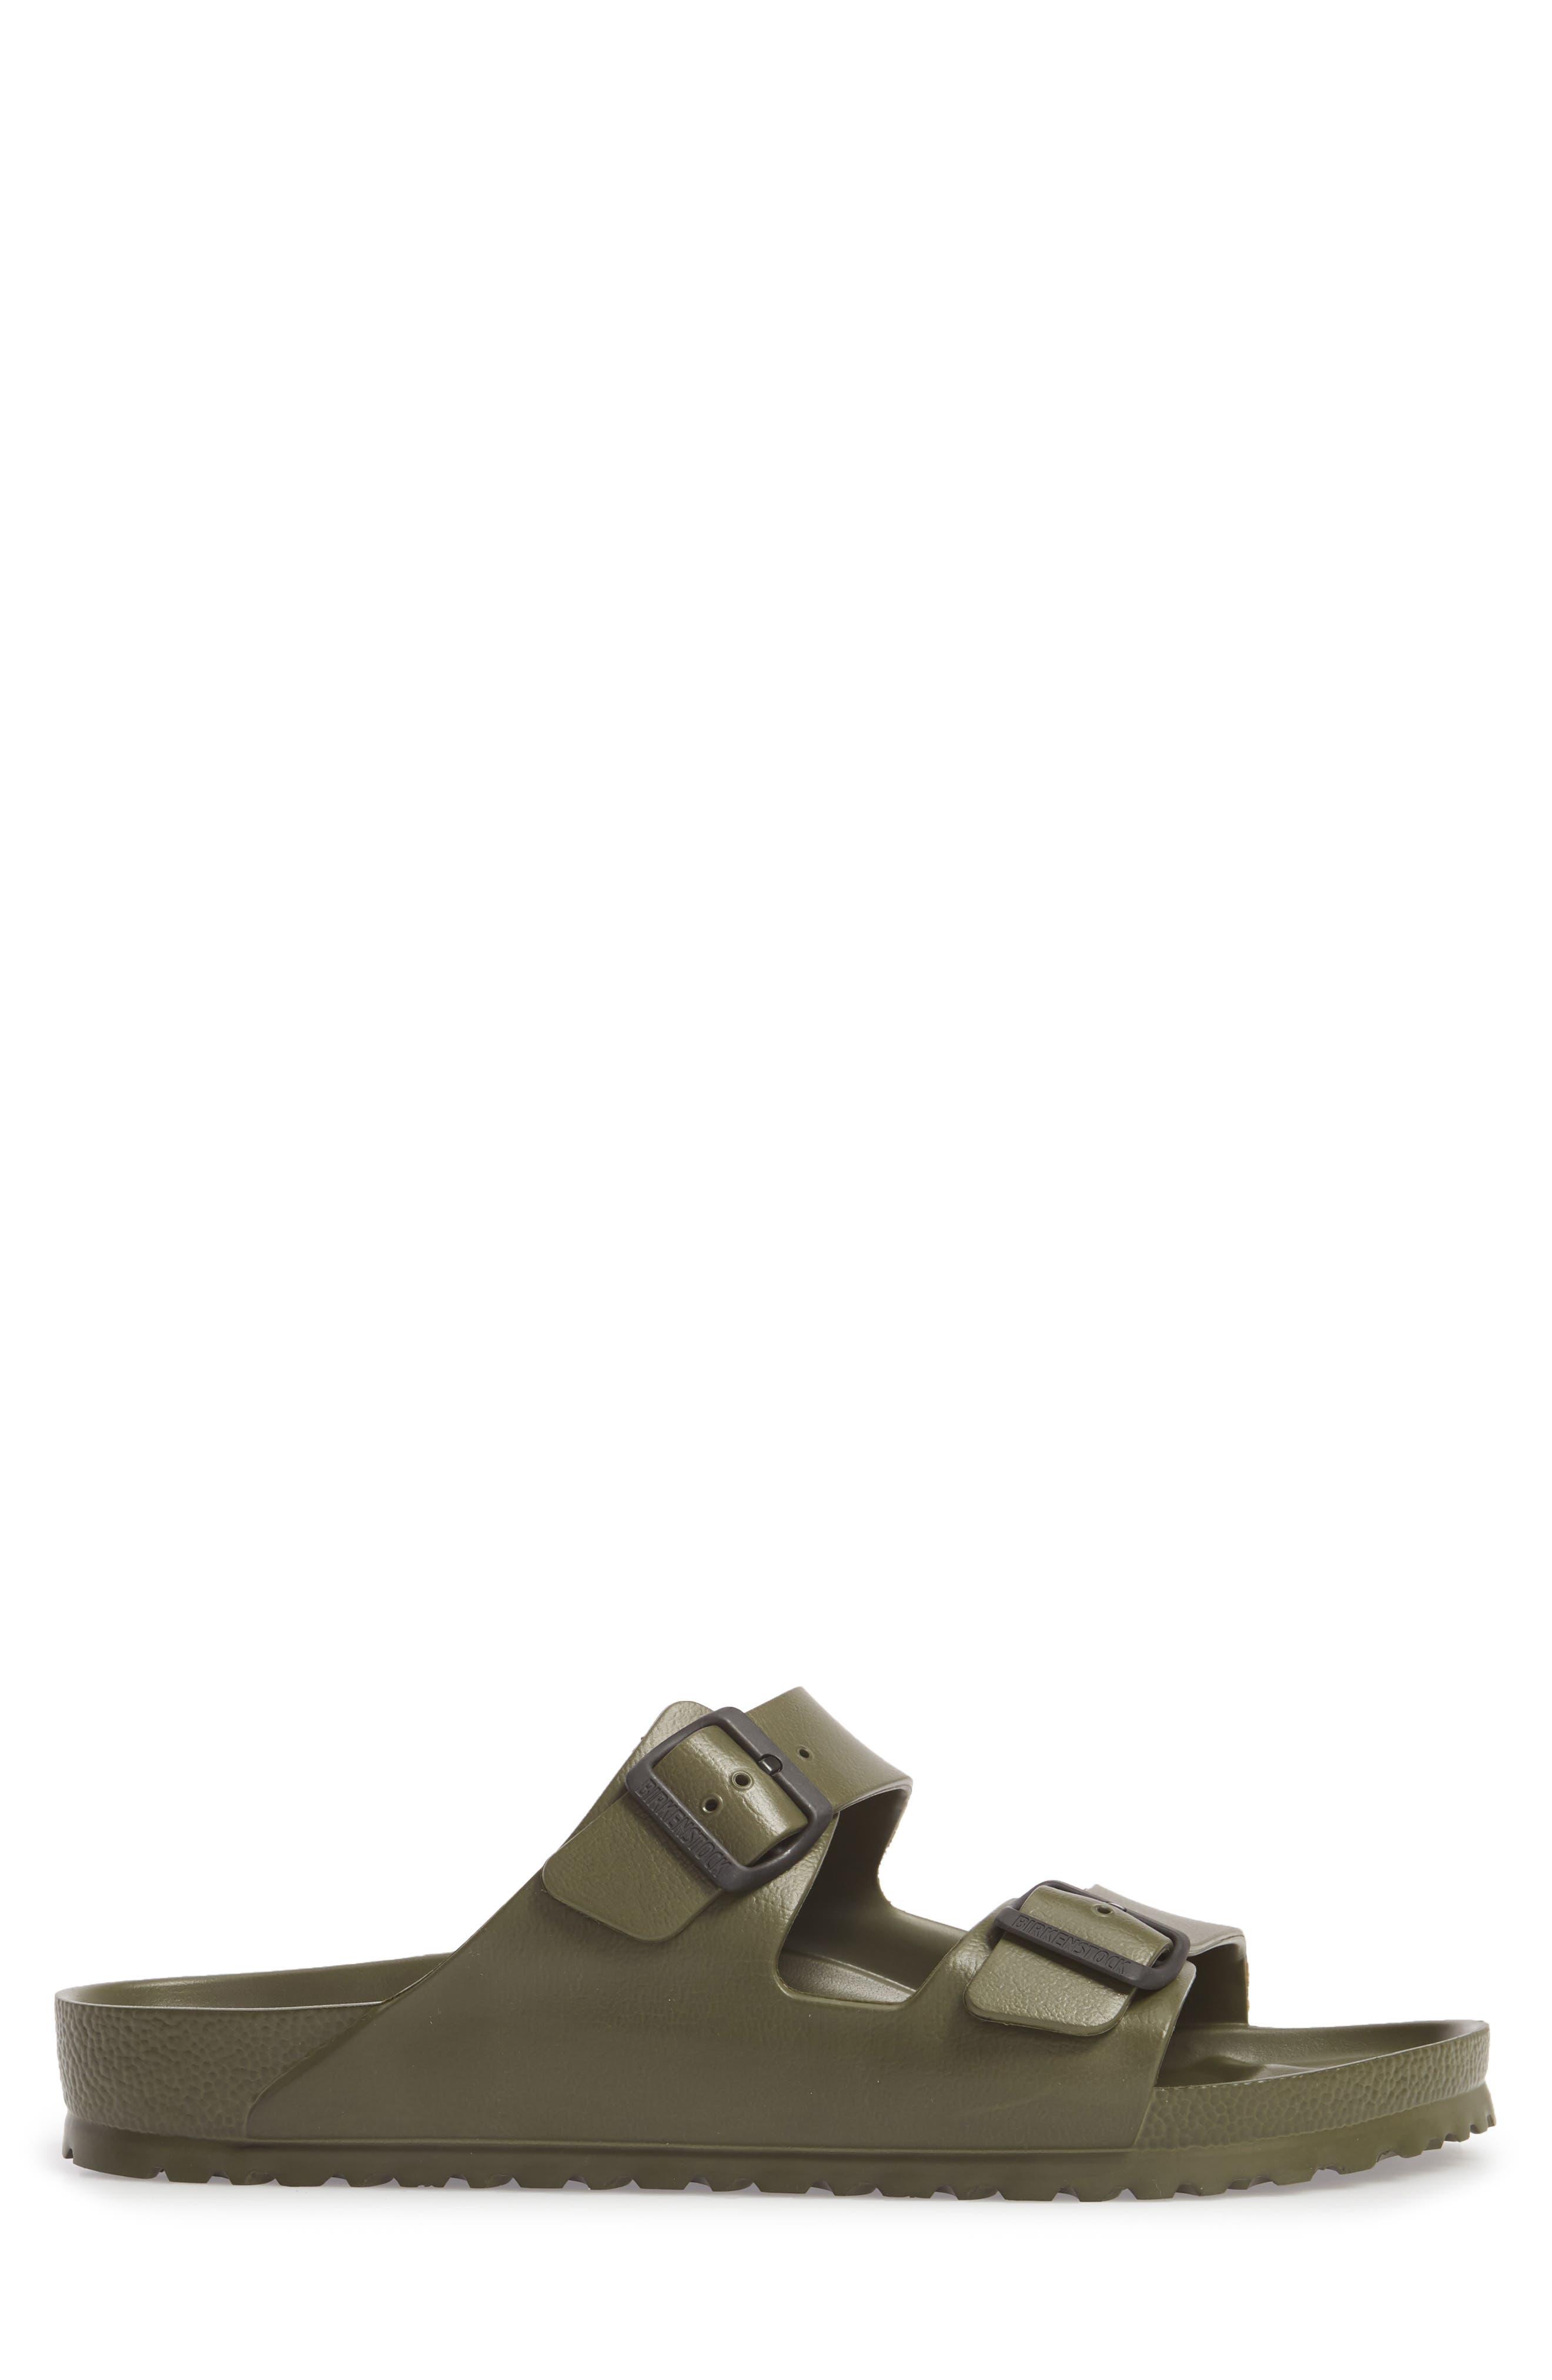 'Essentials - Arizona EVA' Waterproof Slide Sandal,                             Alternate thumbnail 4, color,                             GREEN